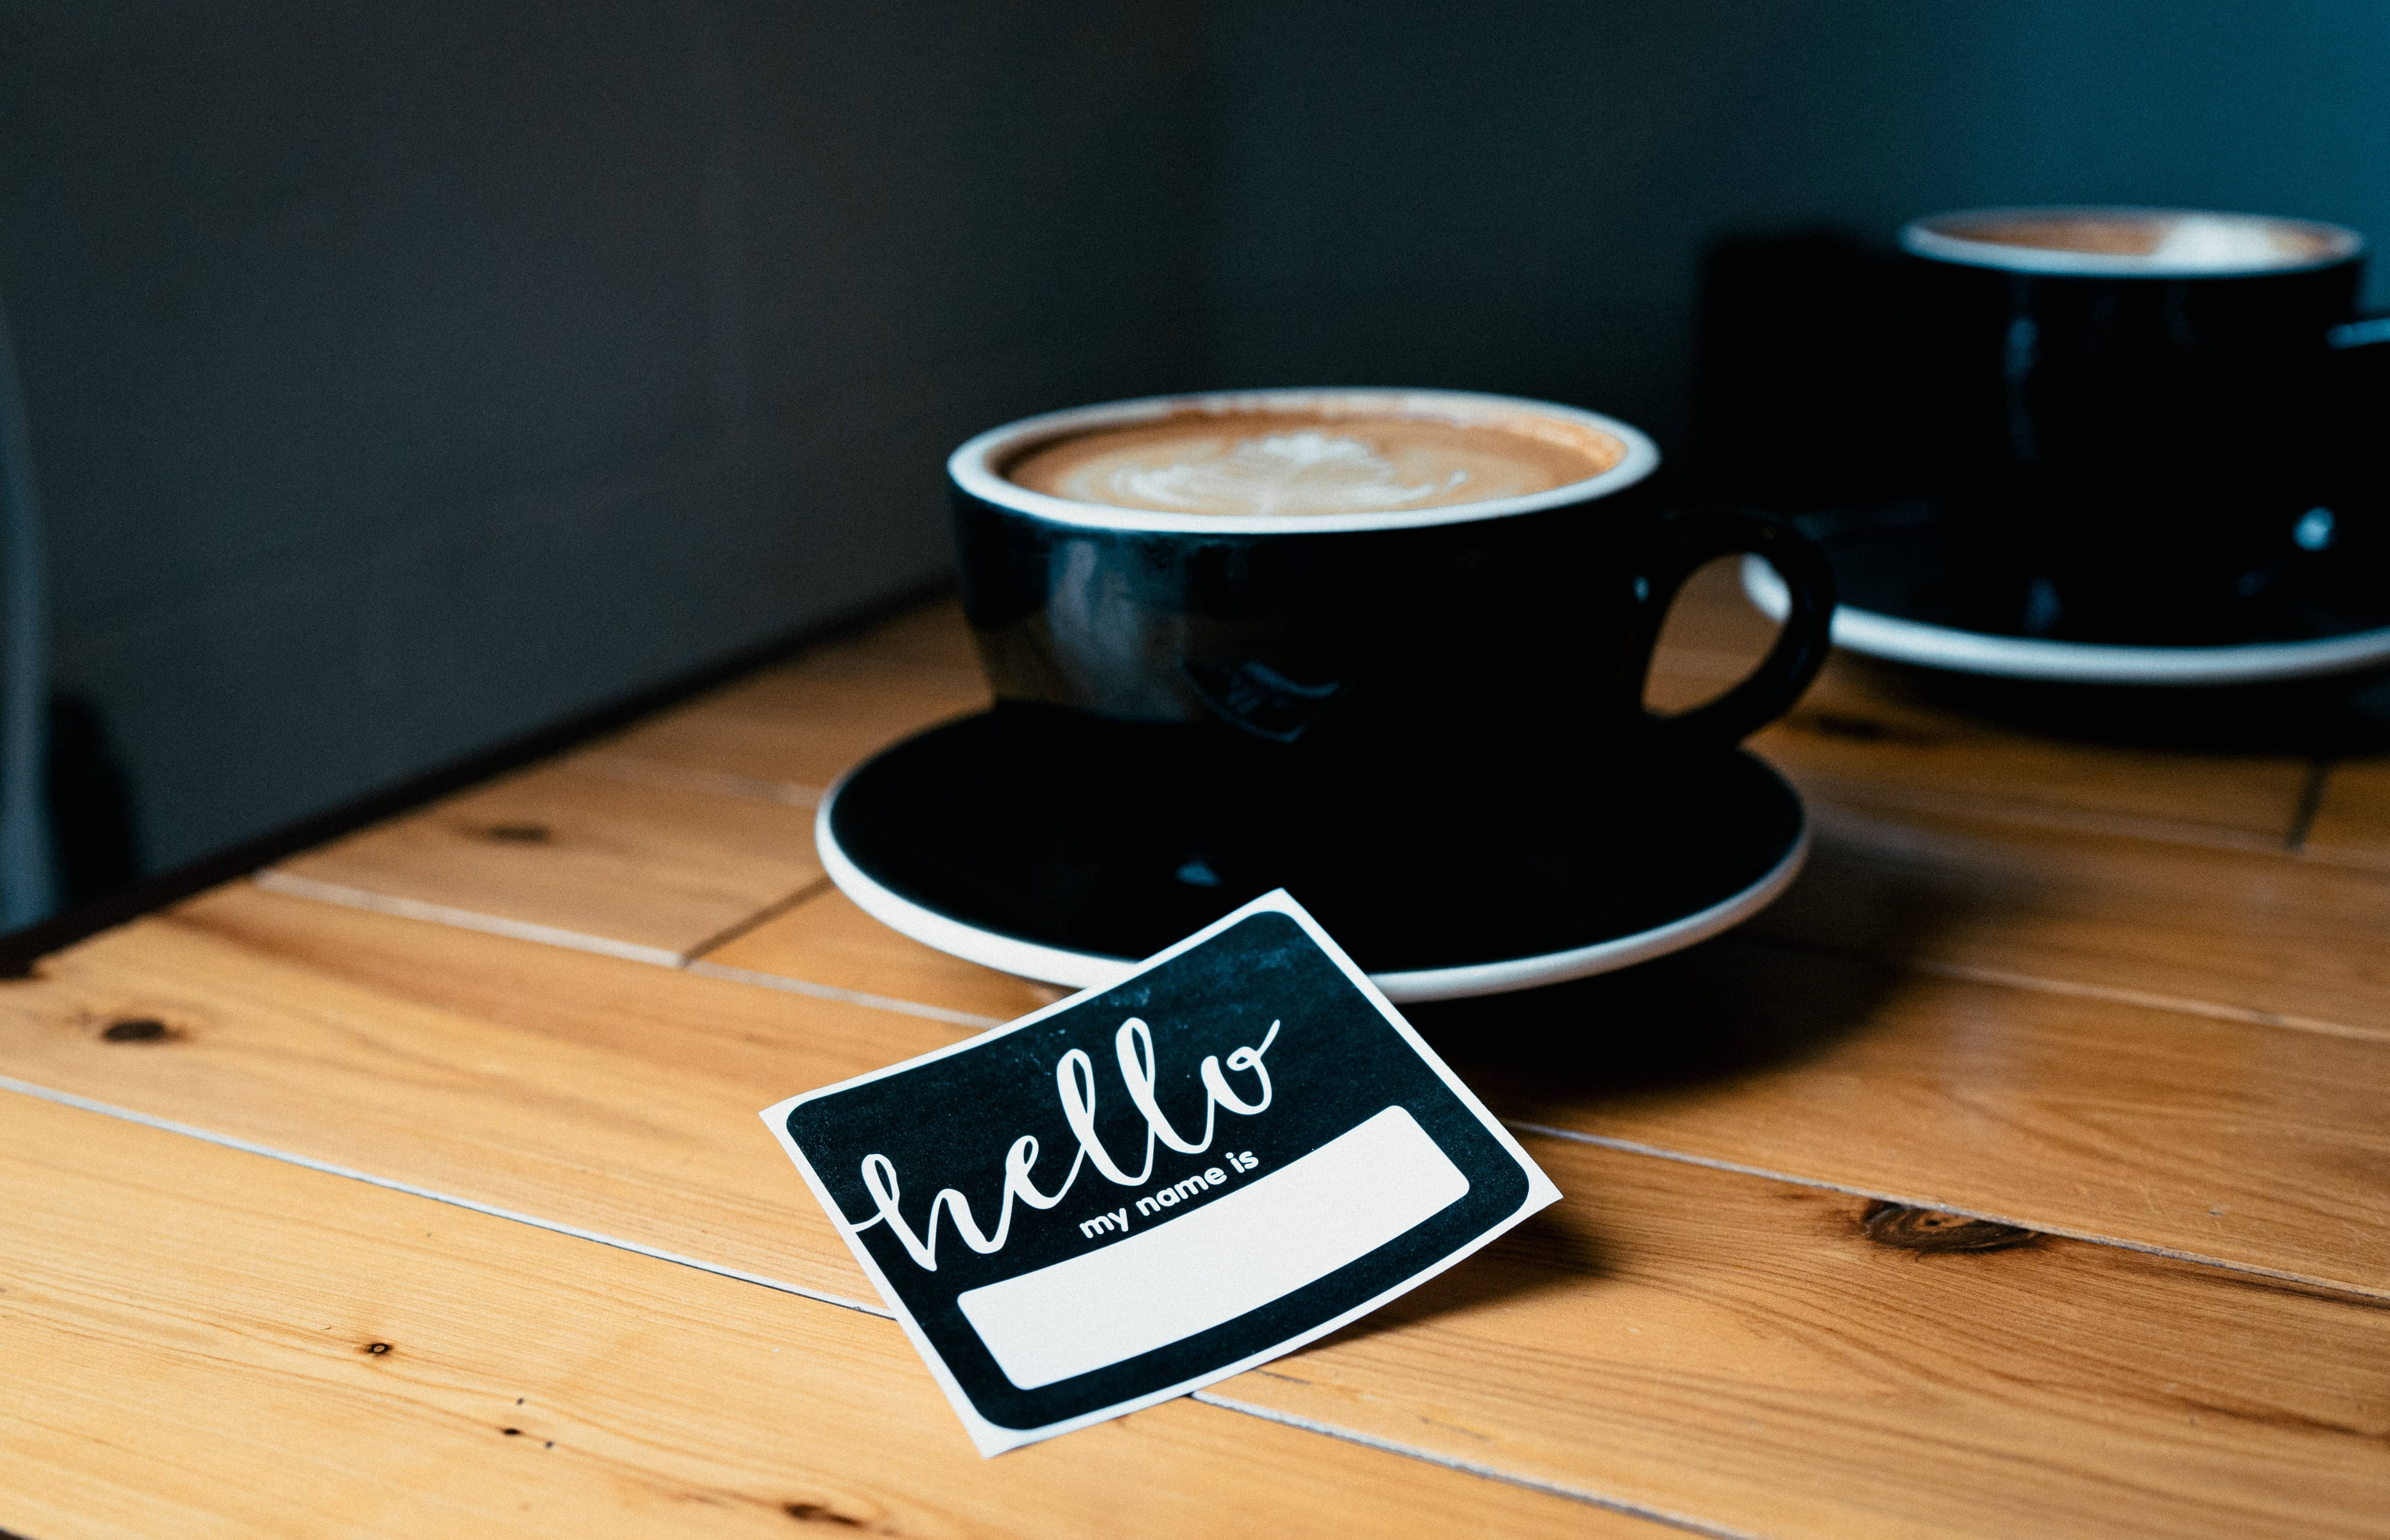 nametag - coffee - prenom anglais - credit : wordsmithmedia (unsplash)